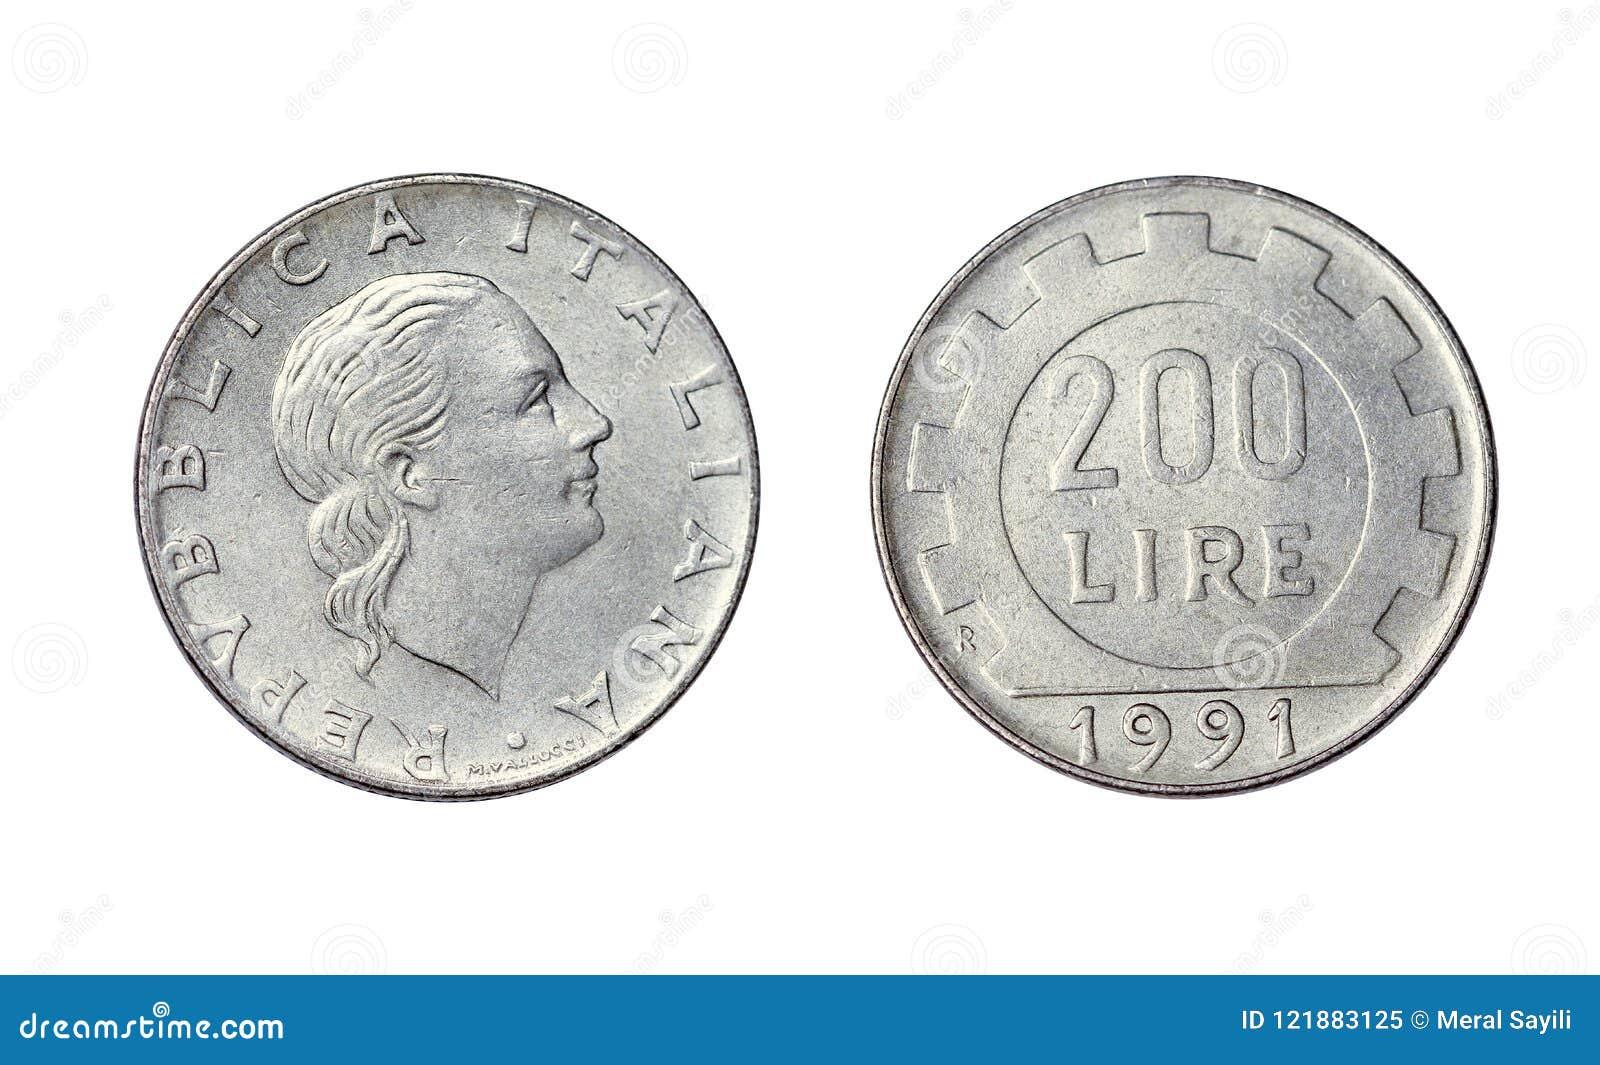 Старая монетка в Италии, 200 лирах года 1991